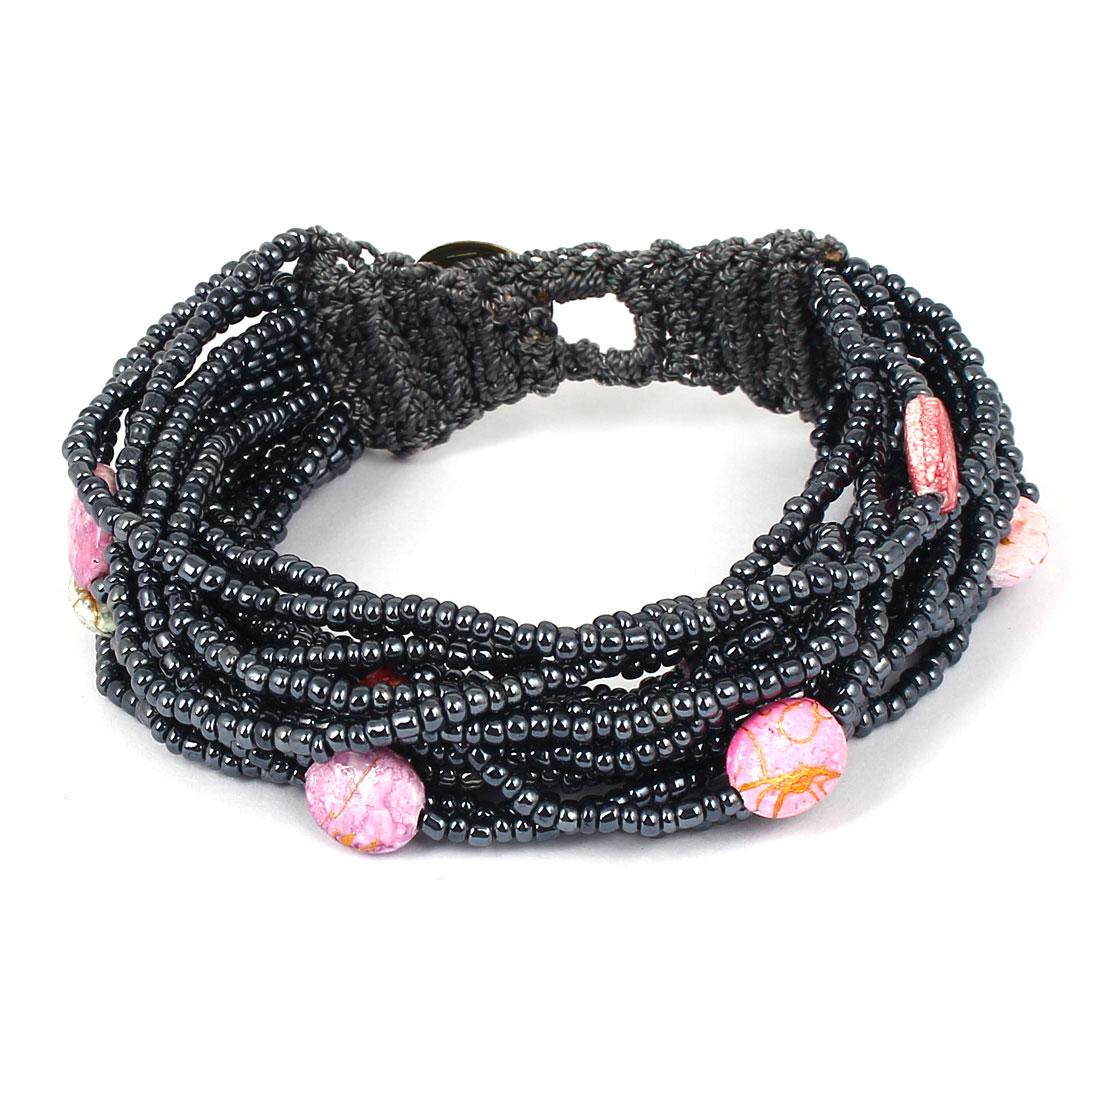 Women Button Closure Bead Chain Multilayer String Bangle Cuff Bracelet Dark Gray